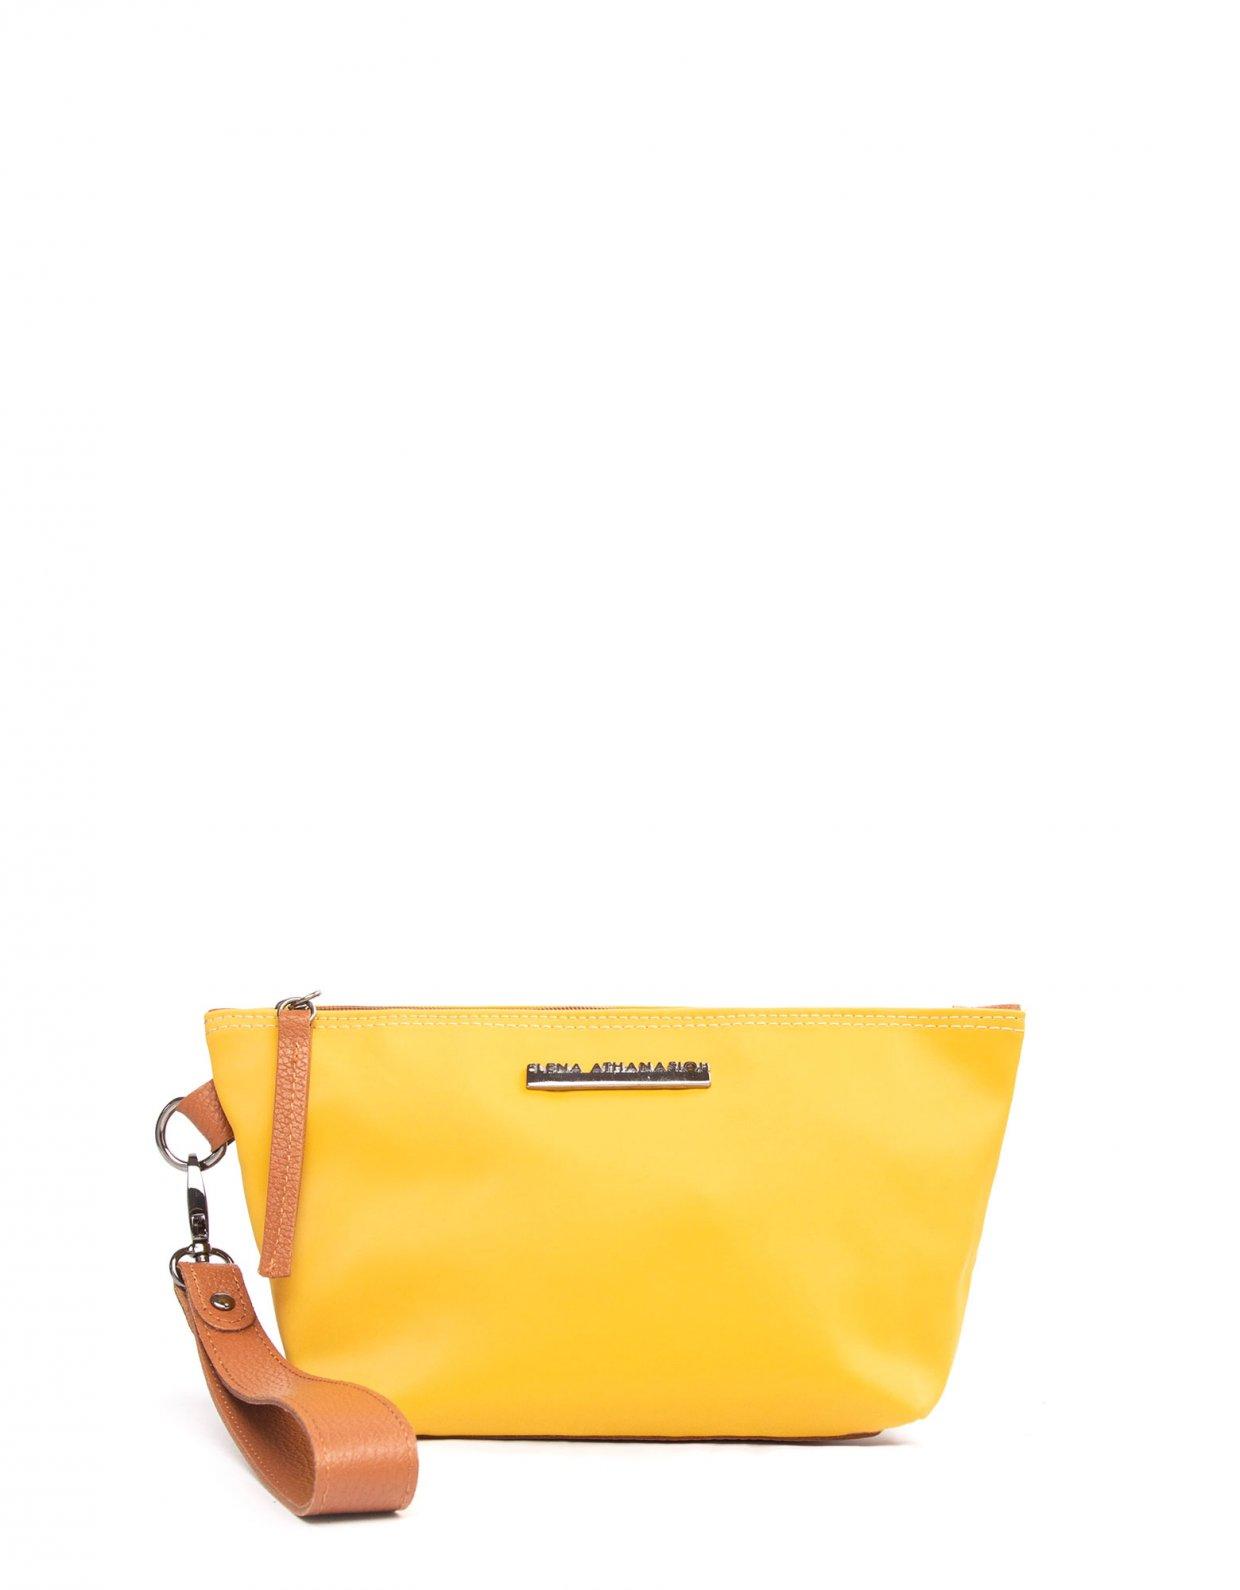 Elena Athanasiou Satin clutch bag yellow